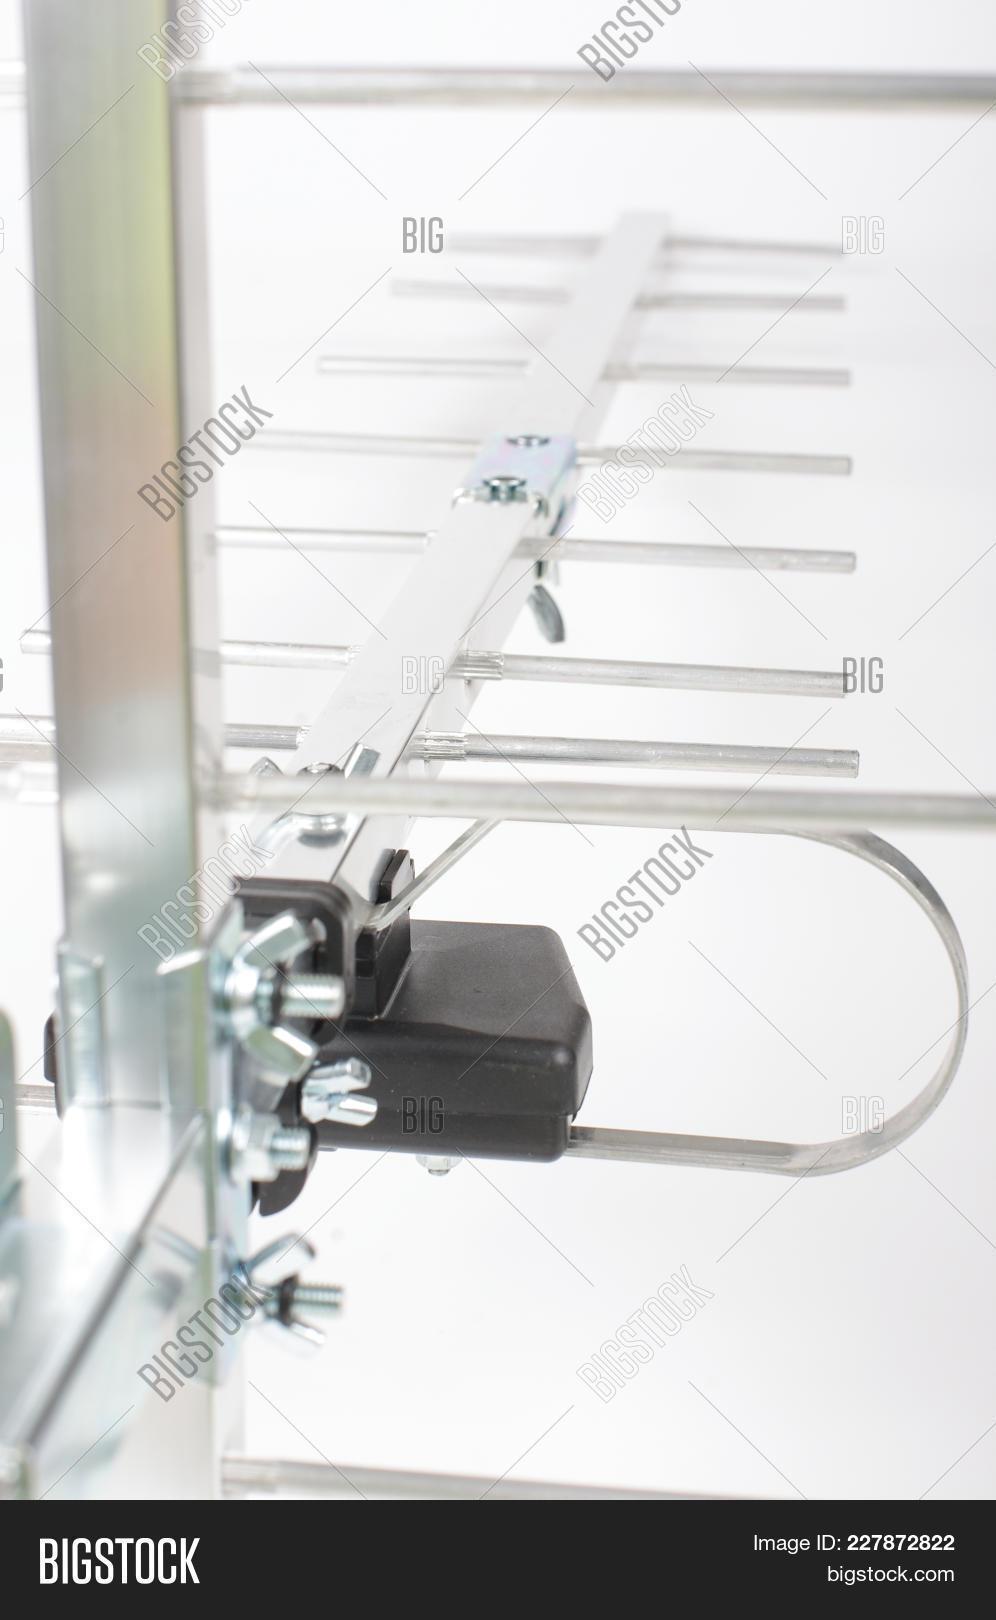 Yagi Uda Antenna Uhf Image & Photo (Free Trial) | Bigstock